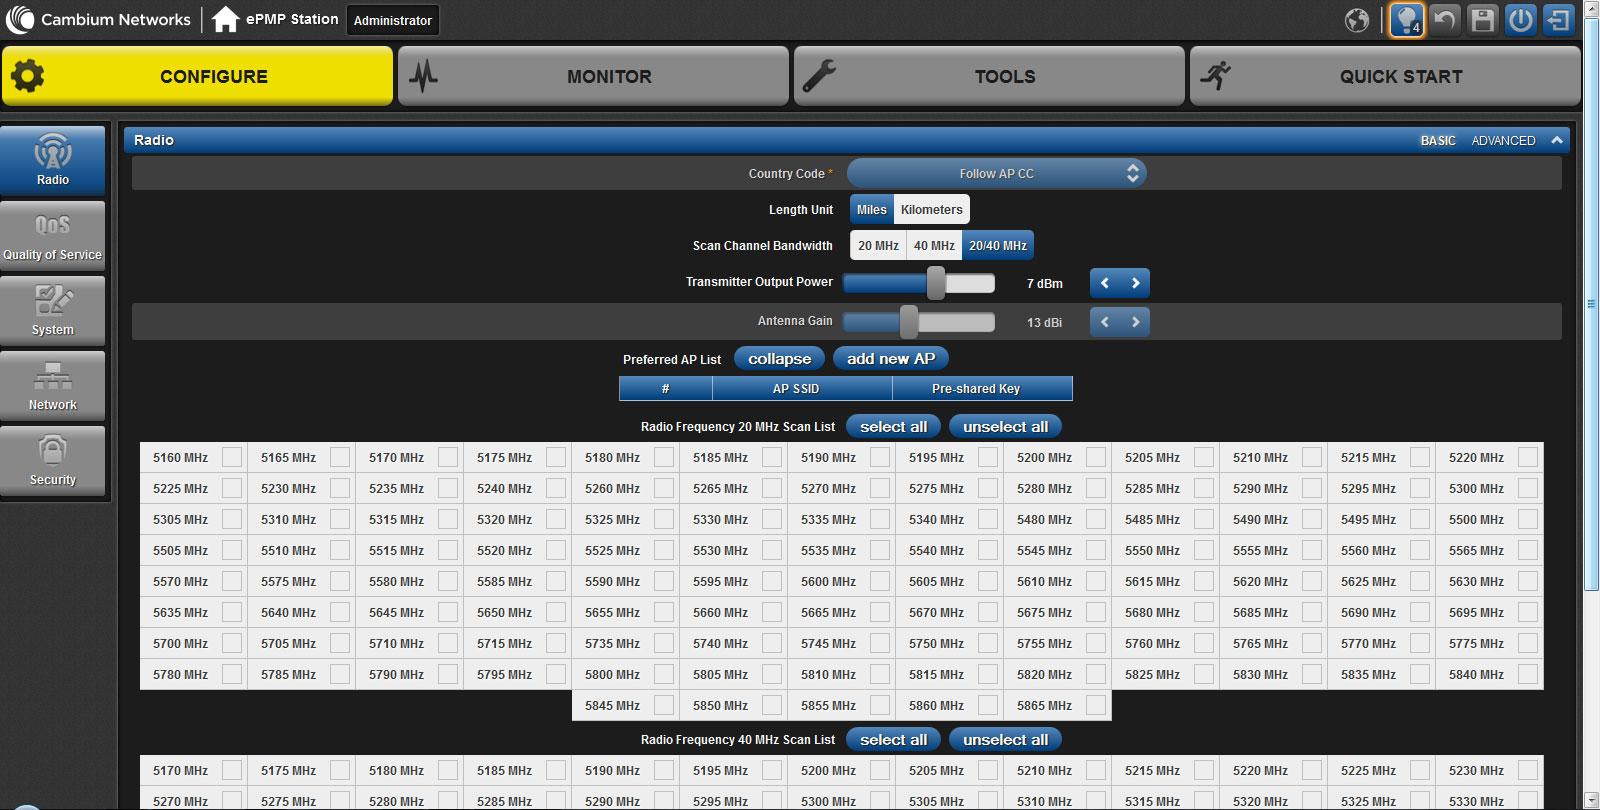 Точная настройка протокола HTTRs для Cambium Networks ePMP-1000